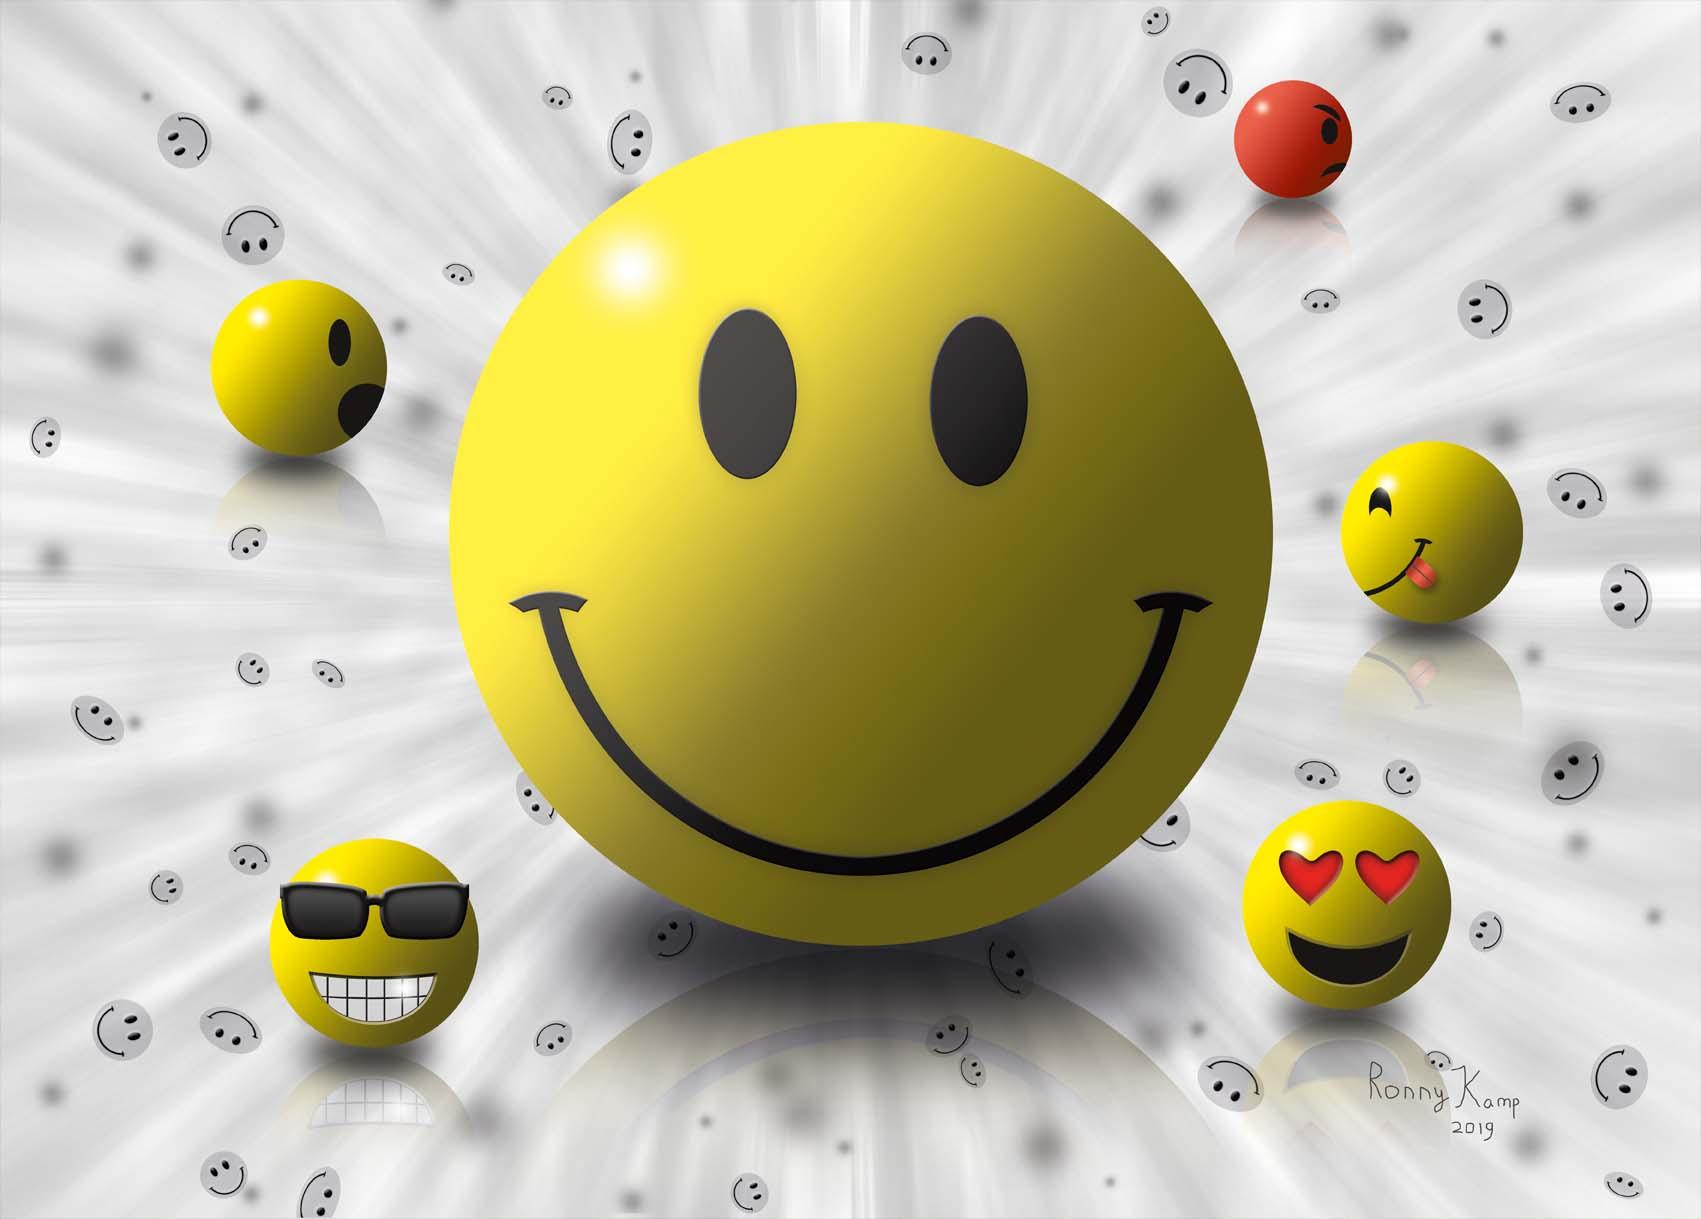 Er gaat niets boven een glimlach